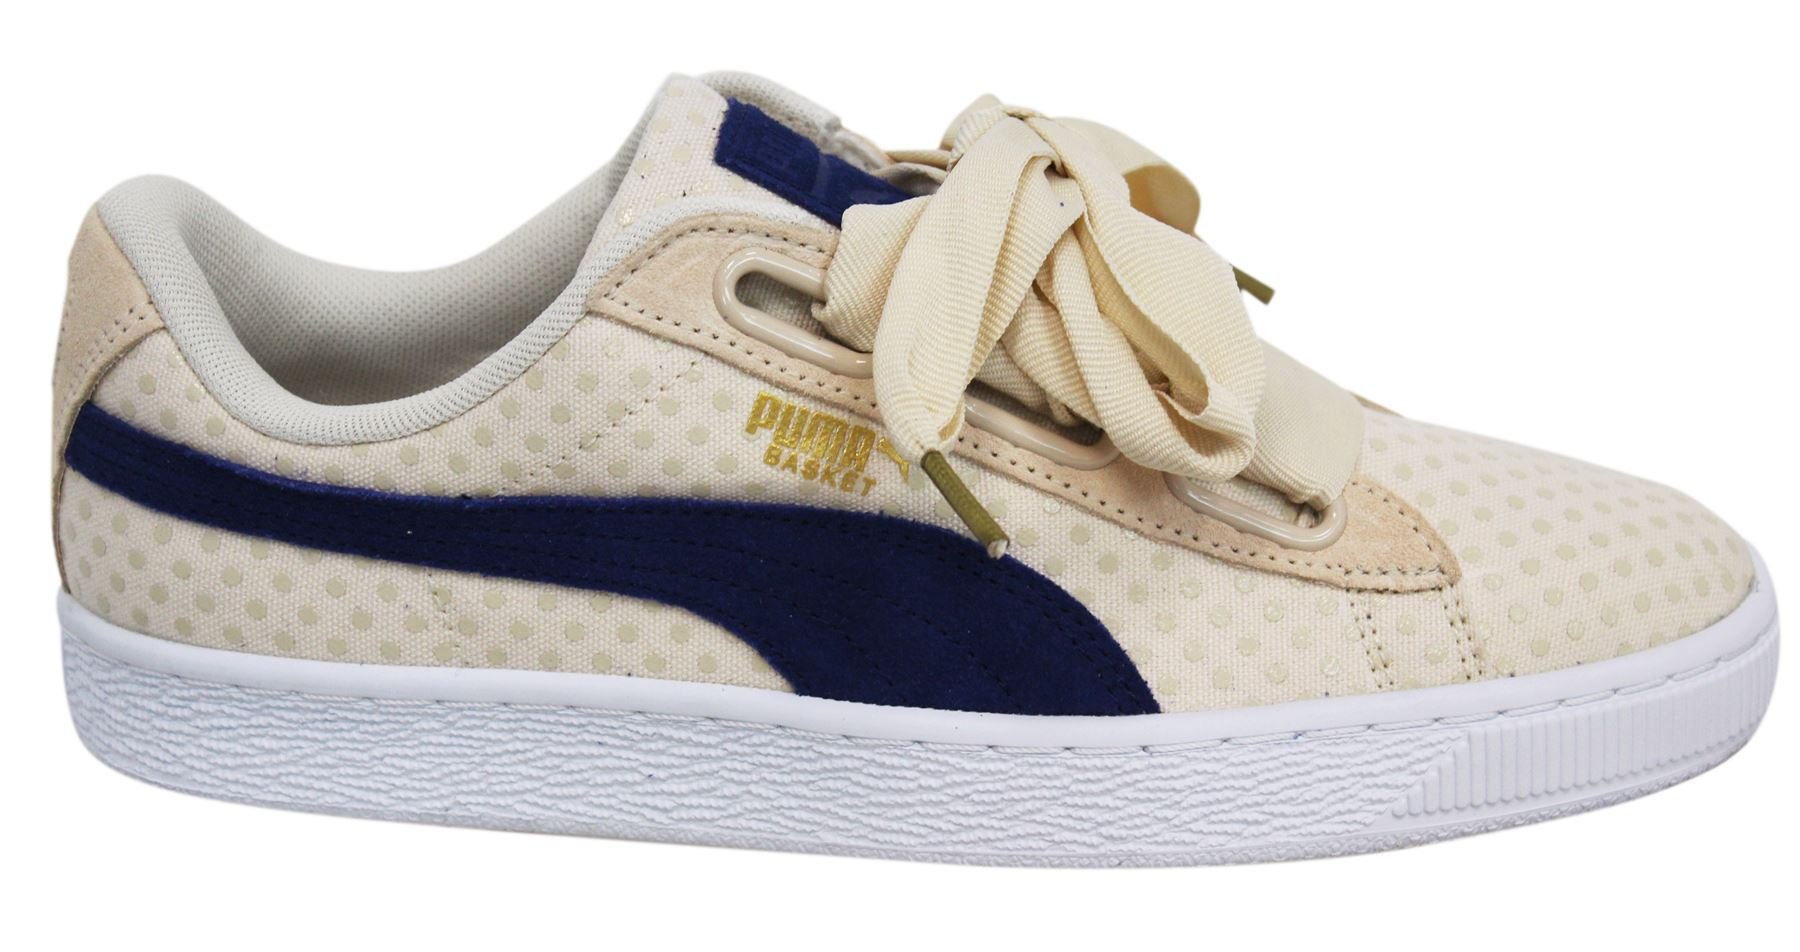 Puma Basket cuore jeans con lacci beige da Donna Scarpe Ginnastica 363371 03 M8